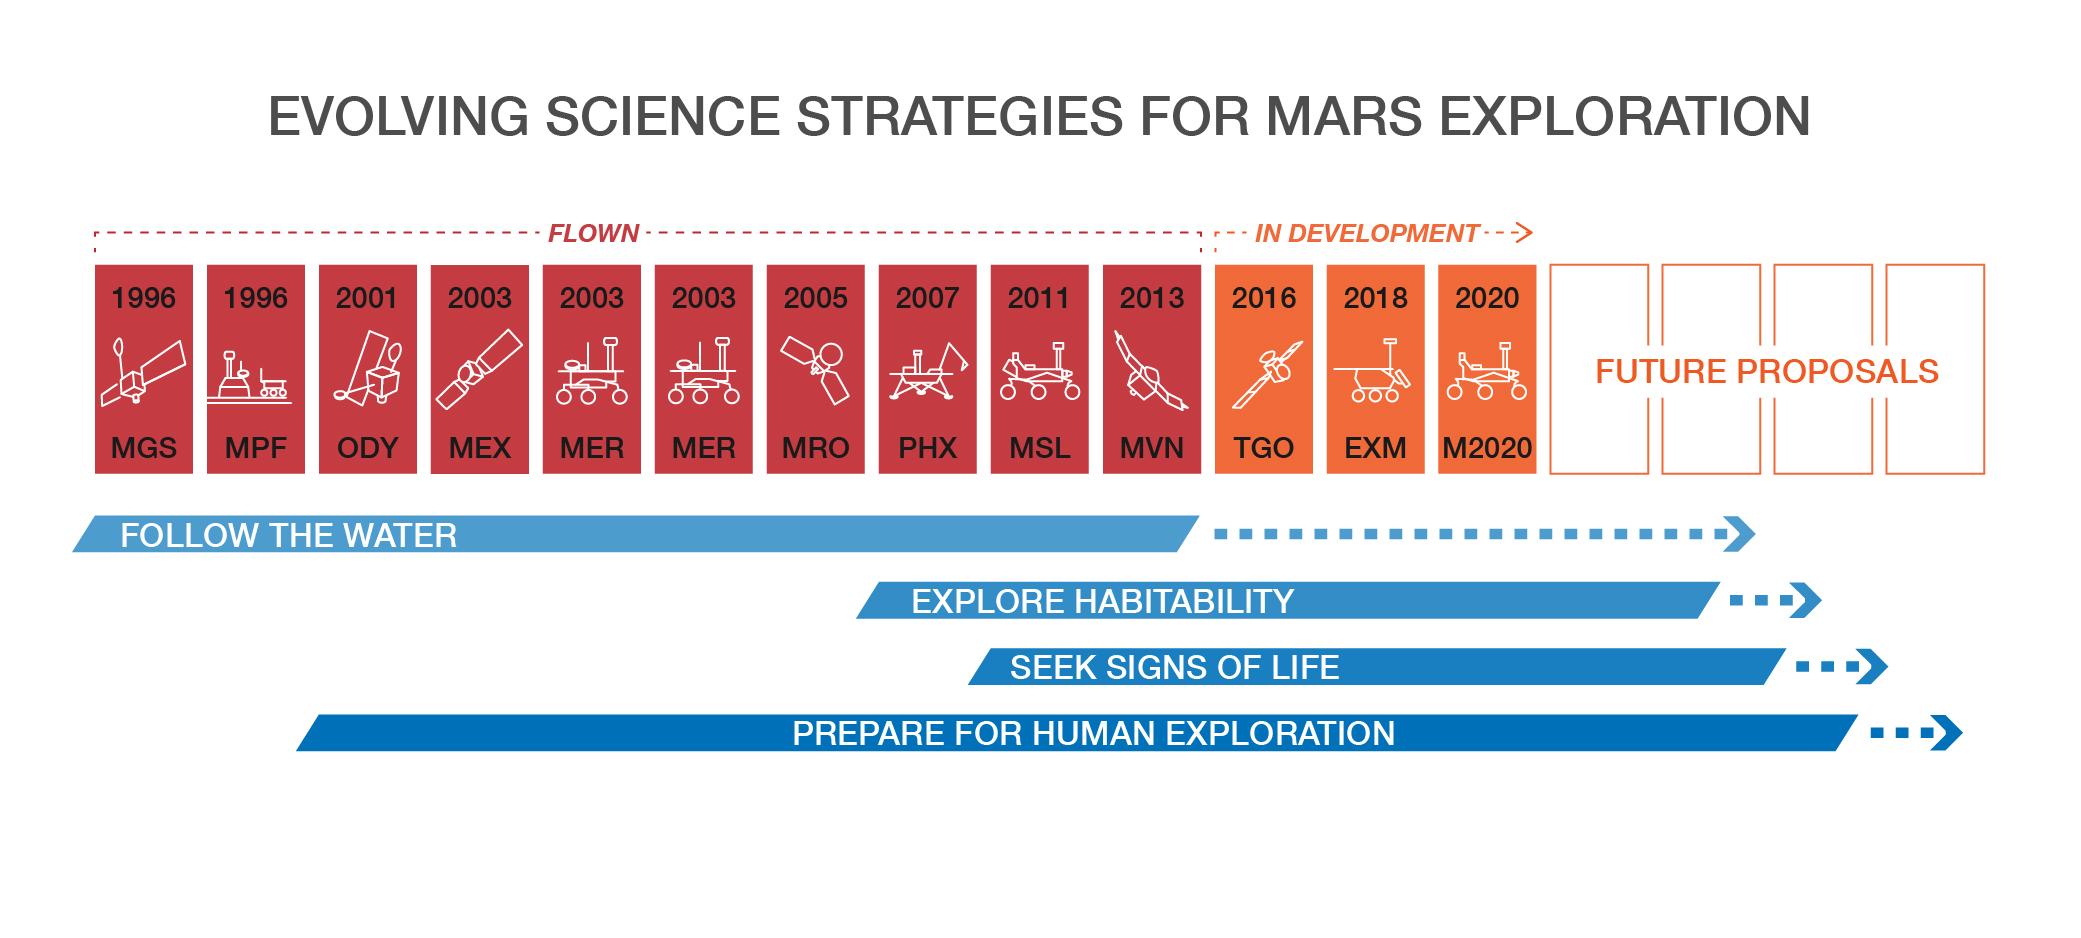 mars exploration rover timeline - photo #16